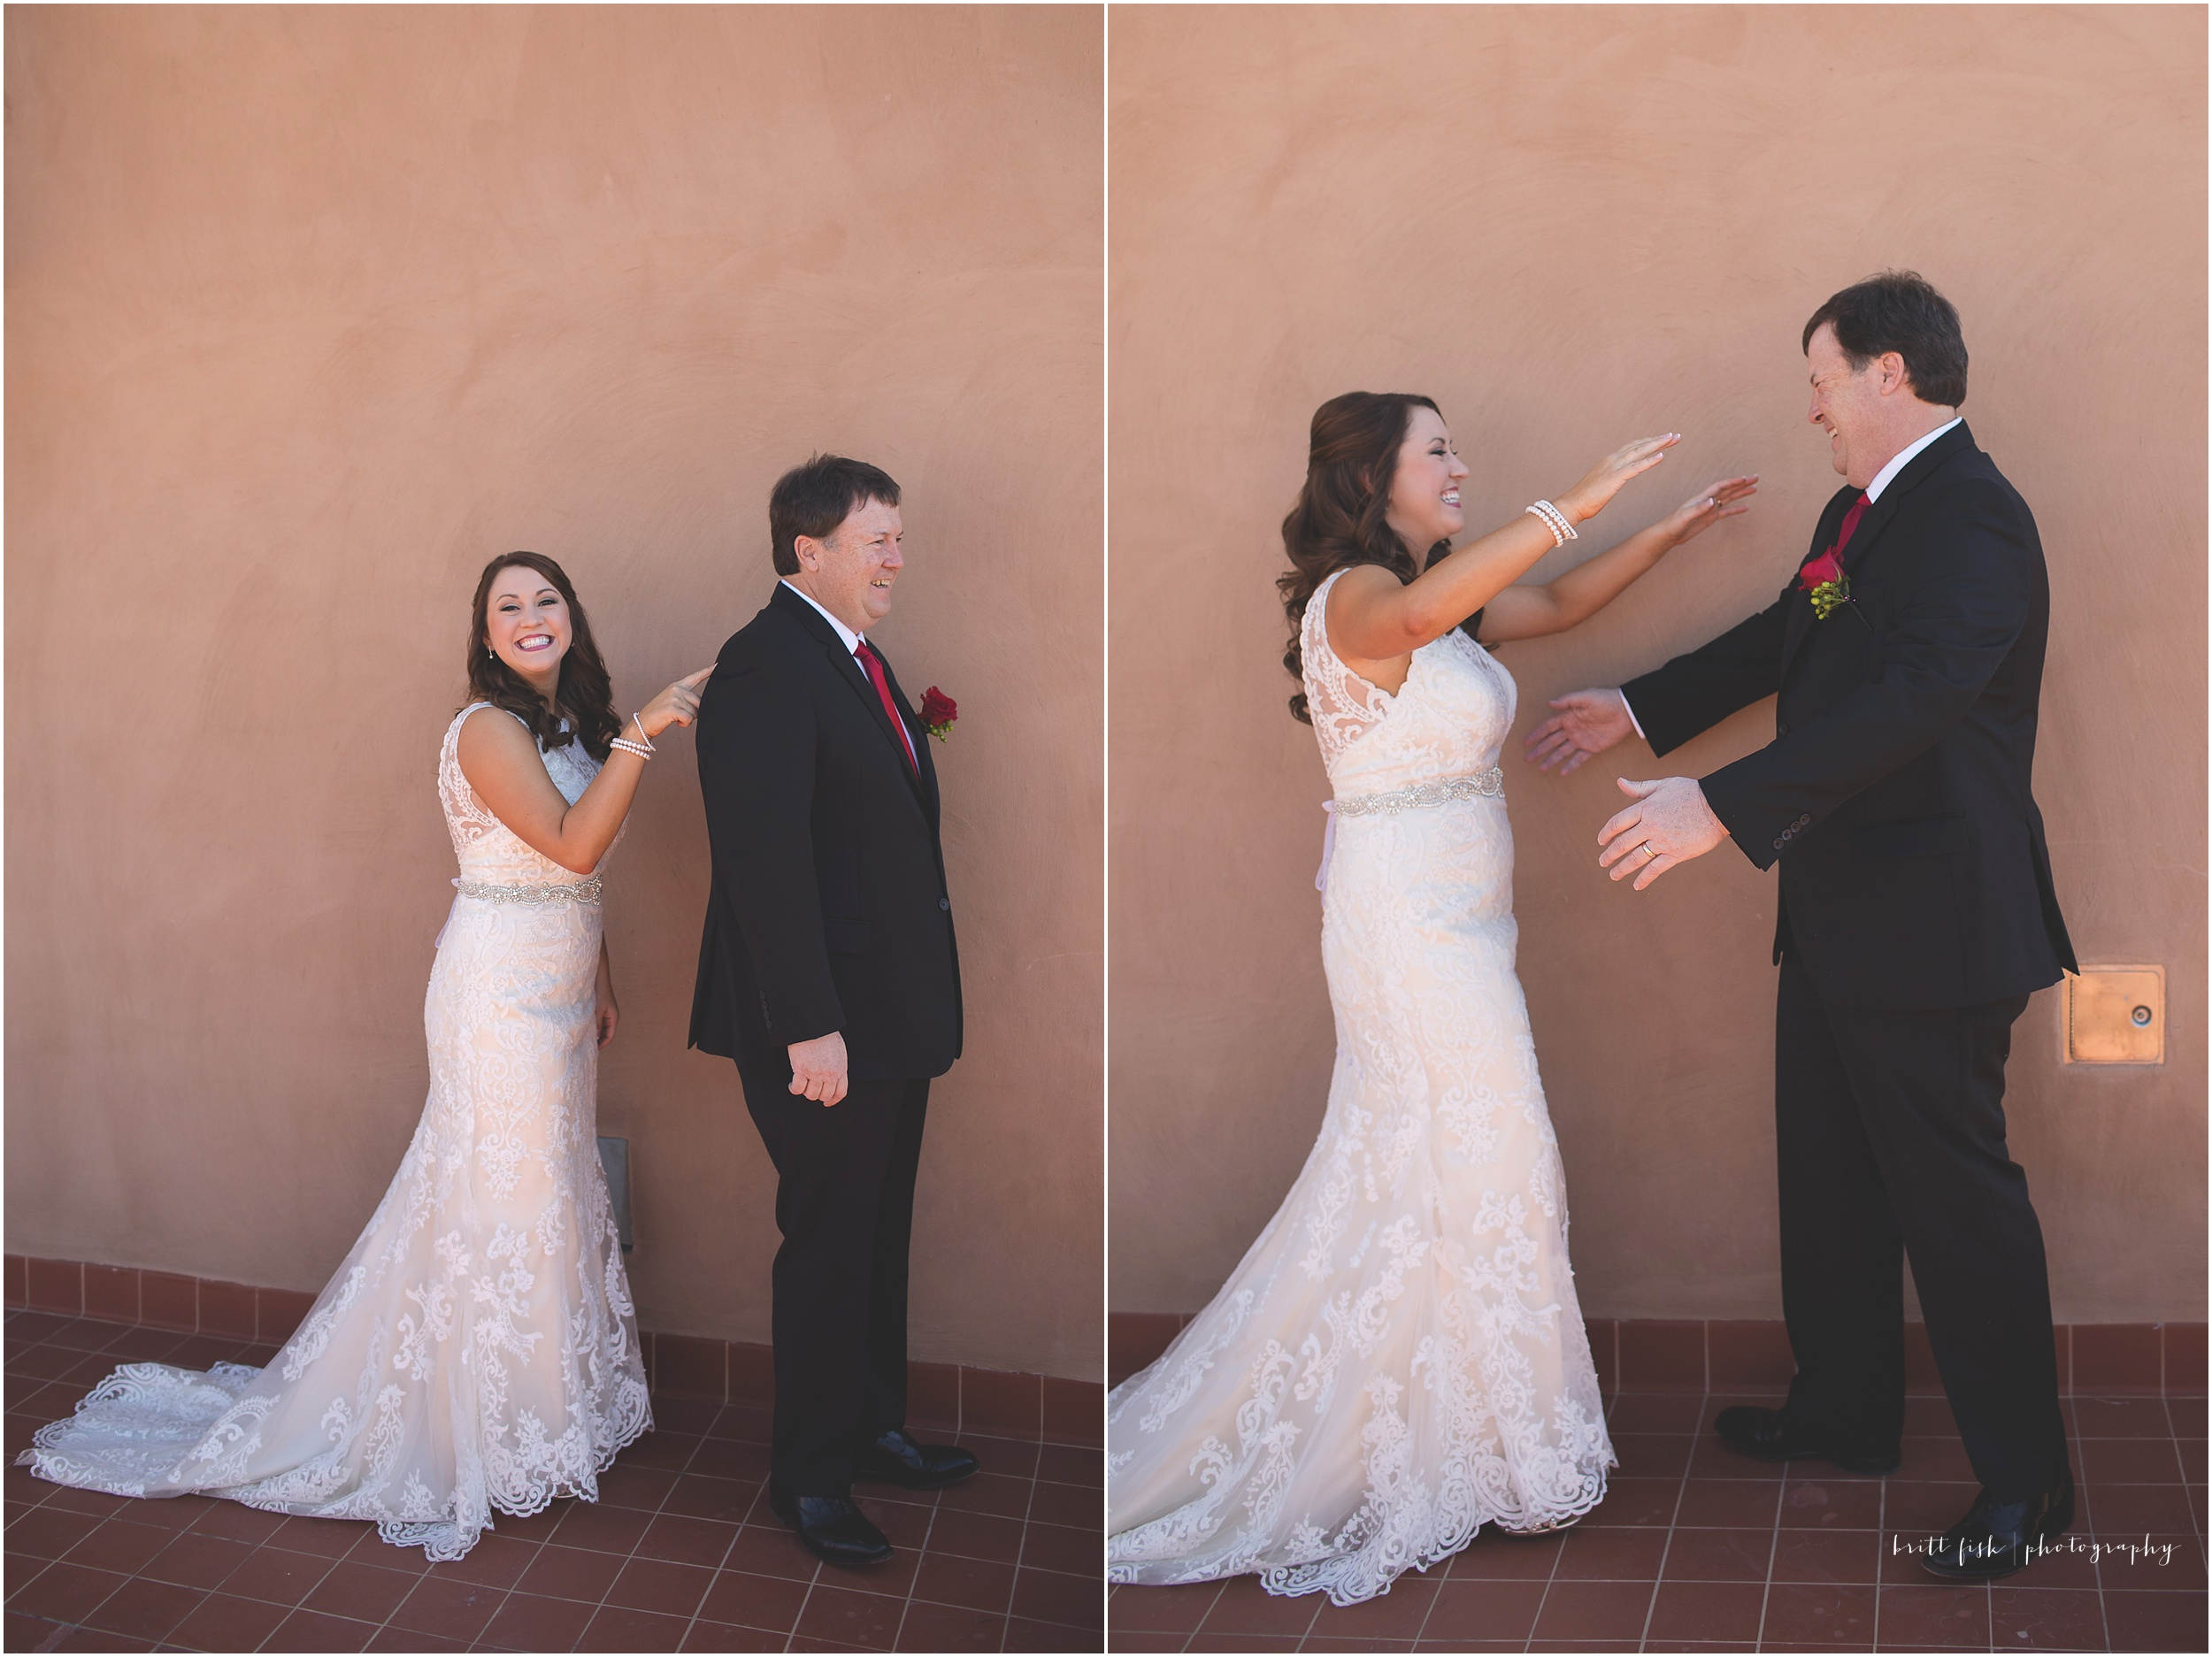 Wedding - Wood - Santa Fe, NM_0012.jpg